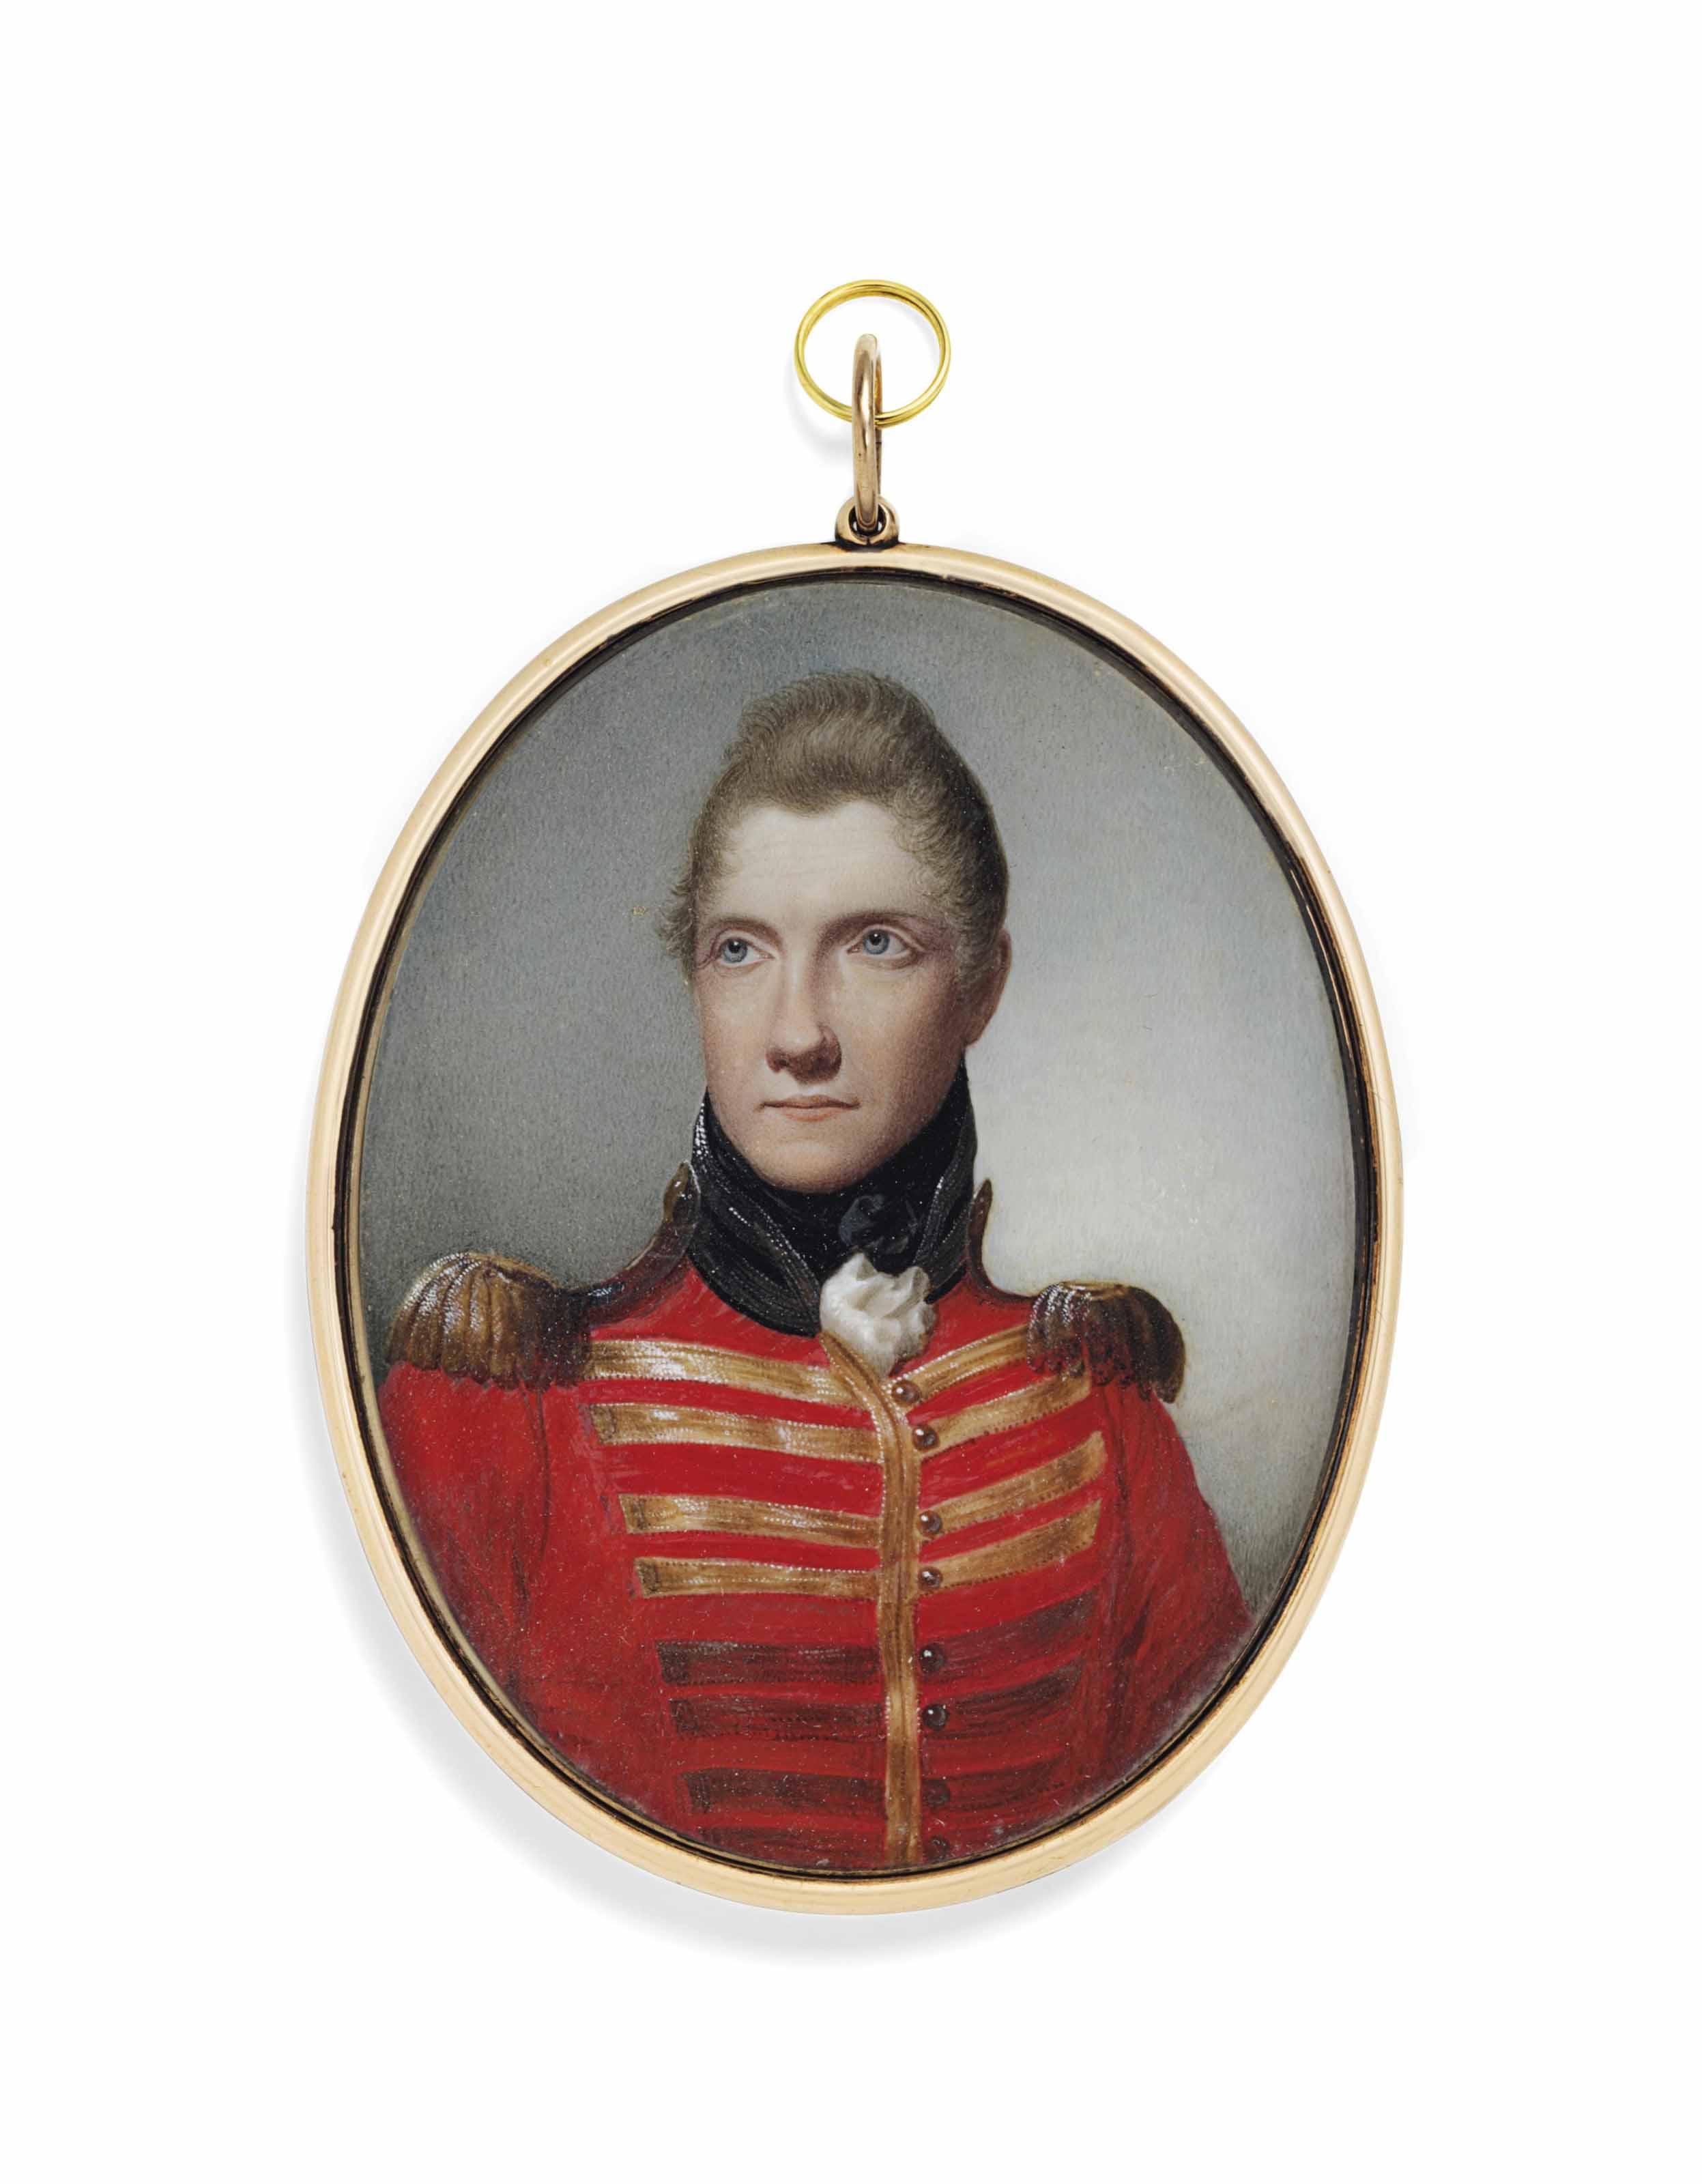 ALEXANDER GALLAWAY (SCOTTISH, FL. C. 1794 - C. 1812)